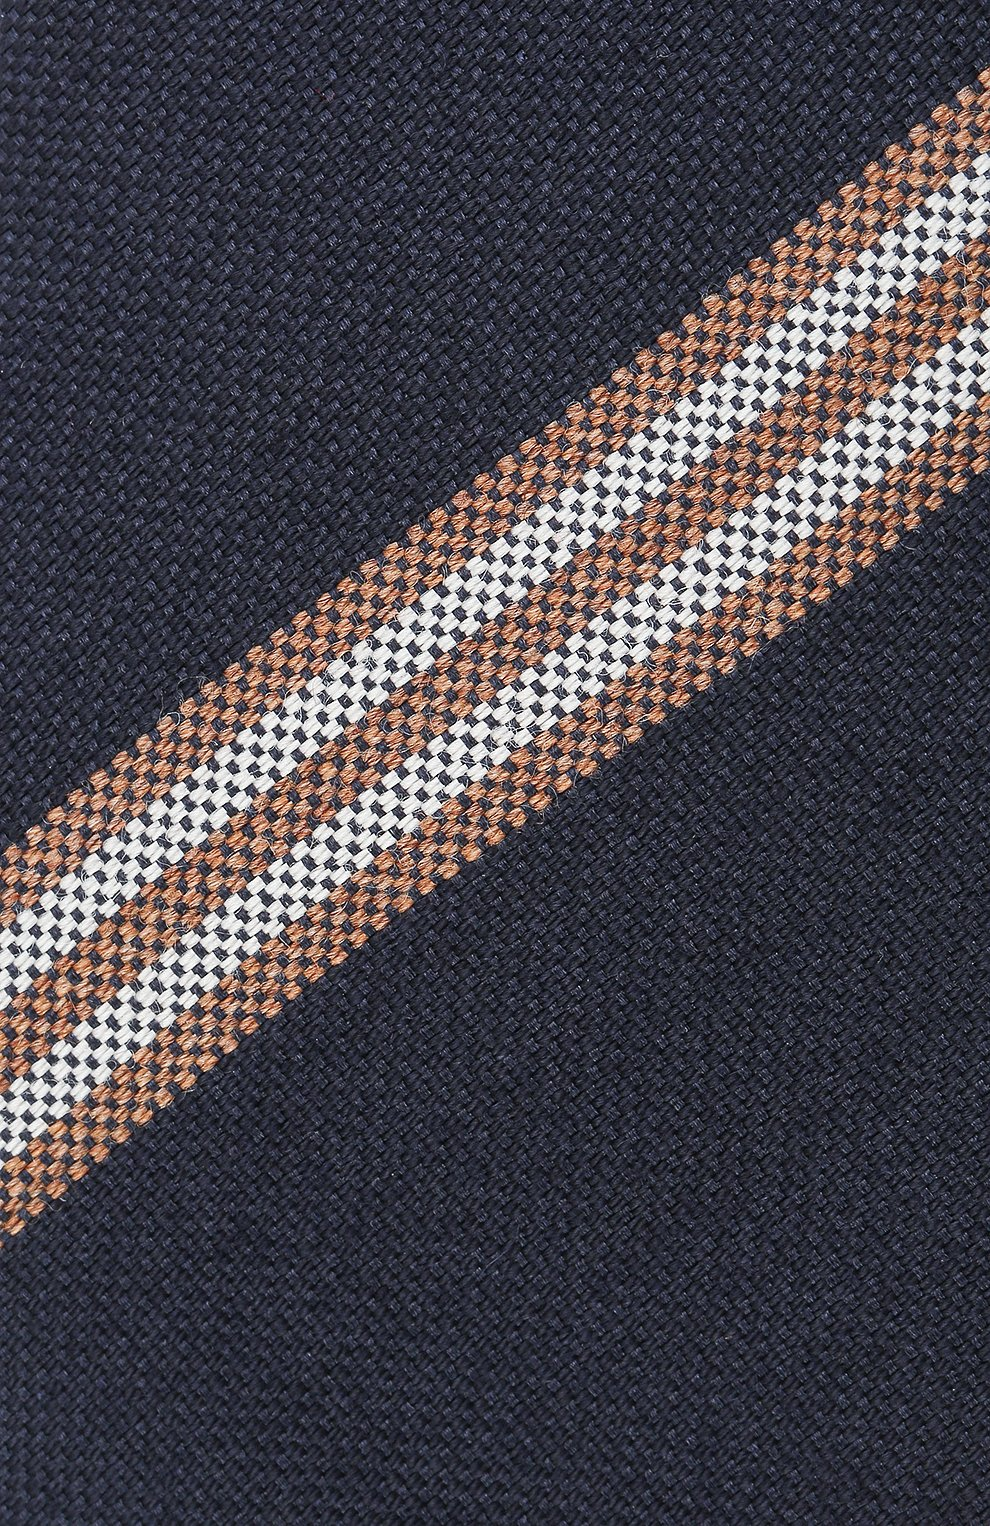 Мужской галстук из шерсти и шелка BRUNELLO CUCINELLI темно-синего цвета, арт. ML8880018 | Фото 3